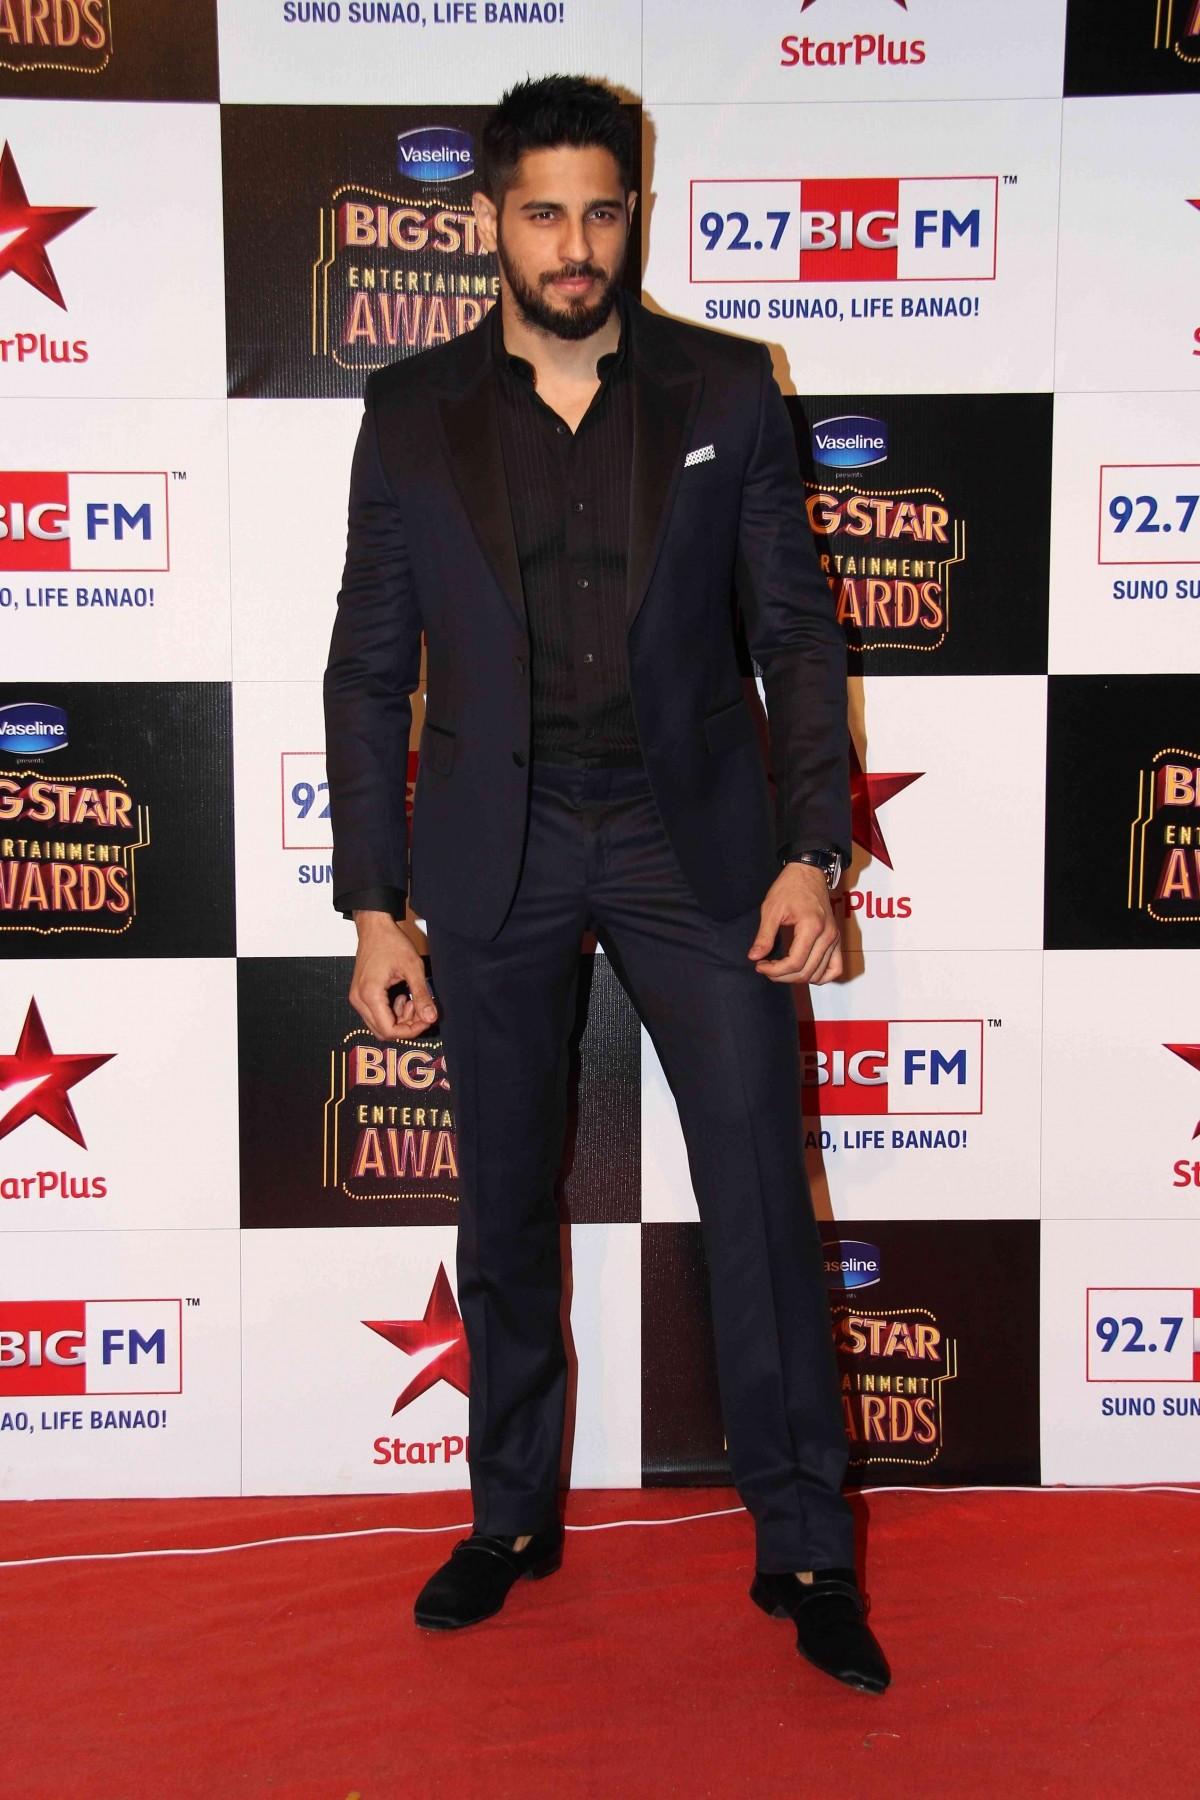 Big Star Entertainment Awards 2014